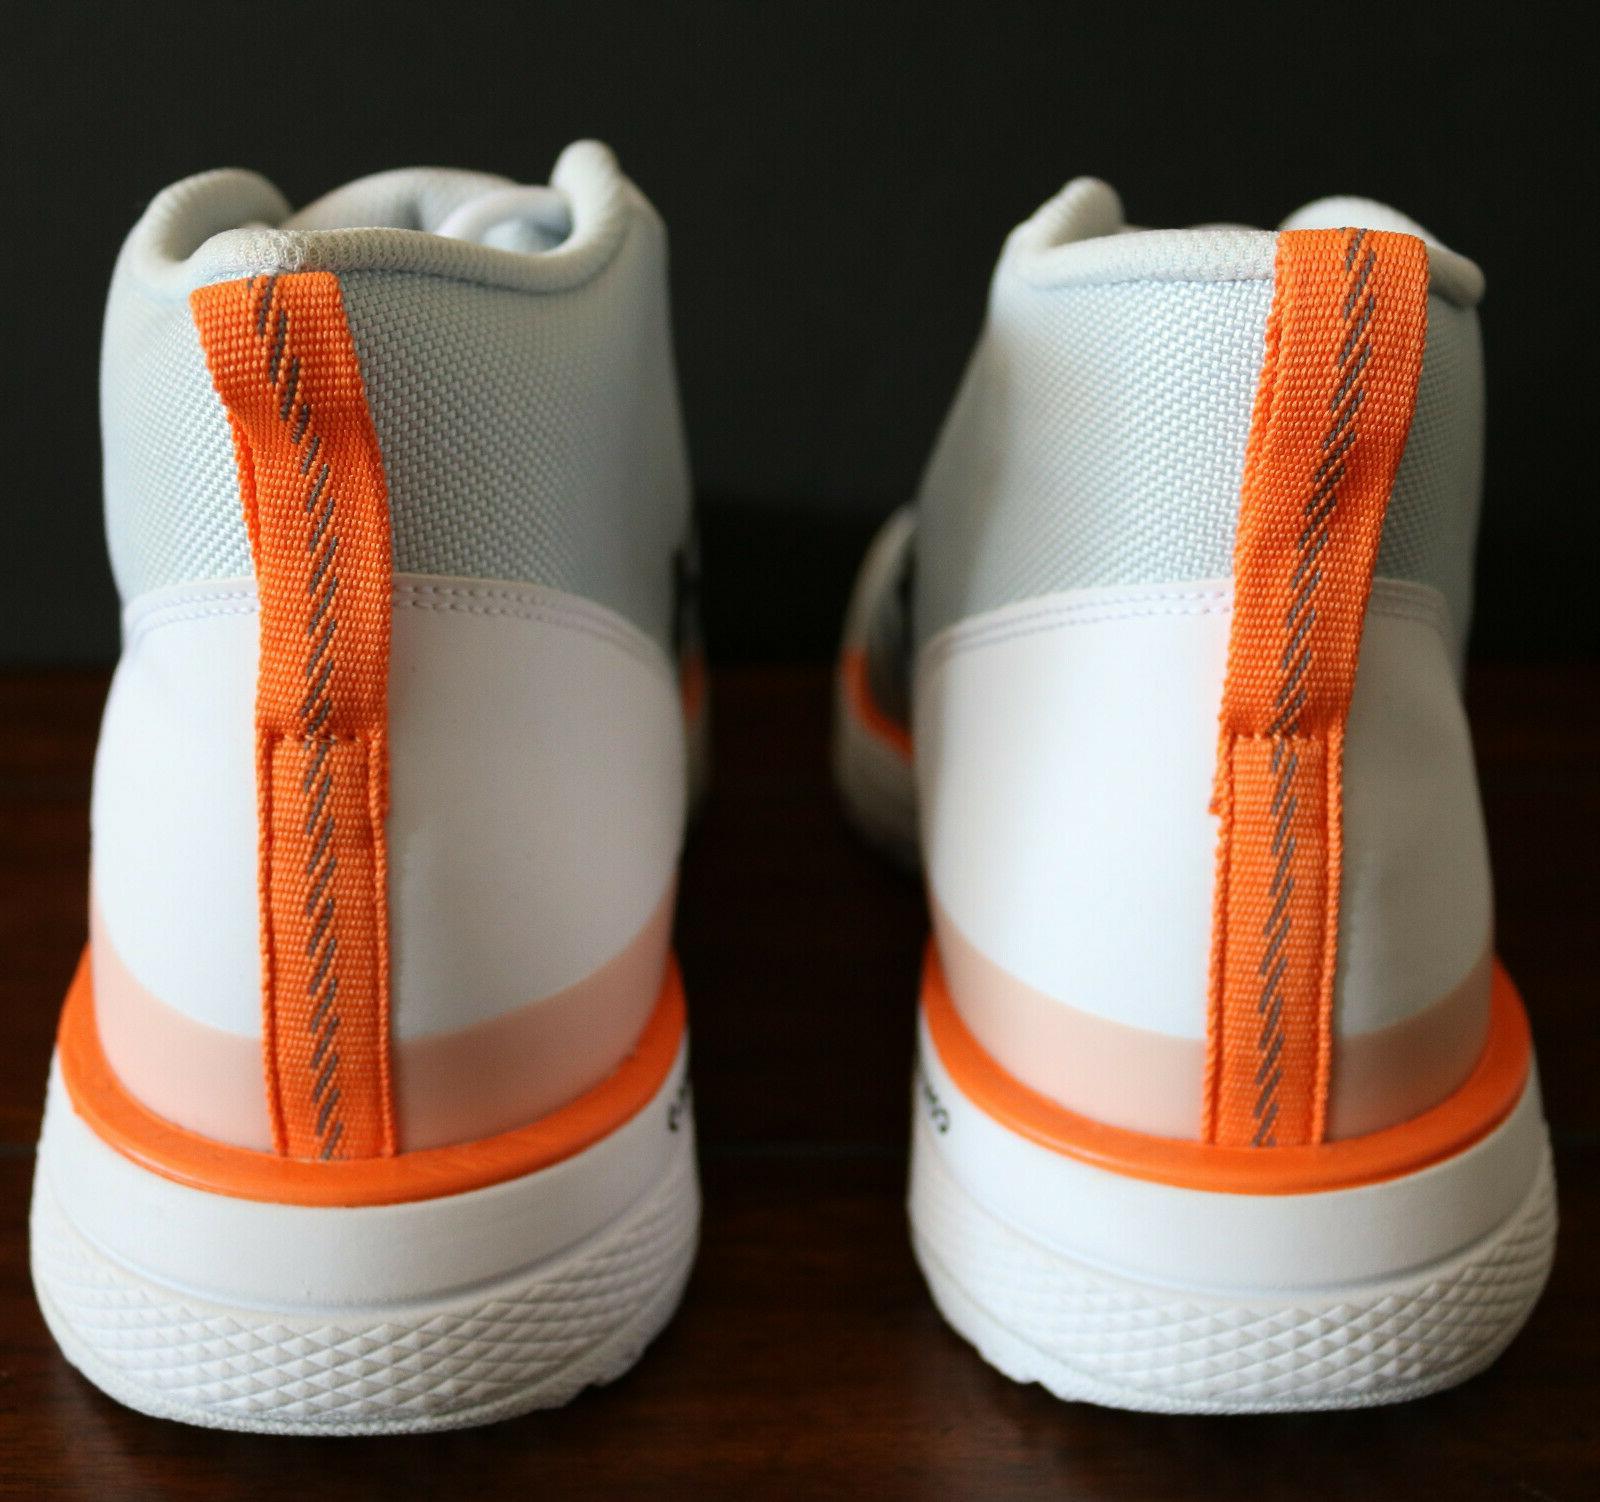 Converse x Basketball Shoes B 10.5